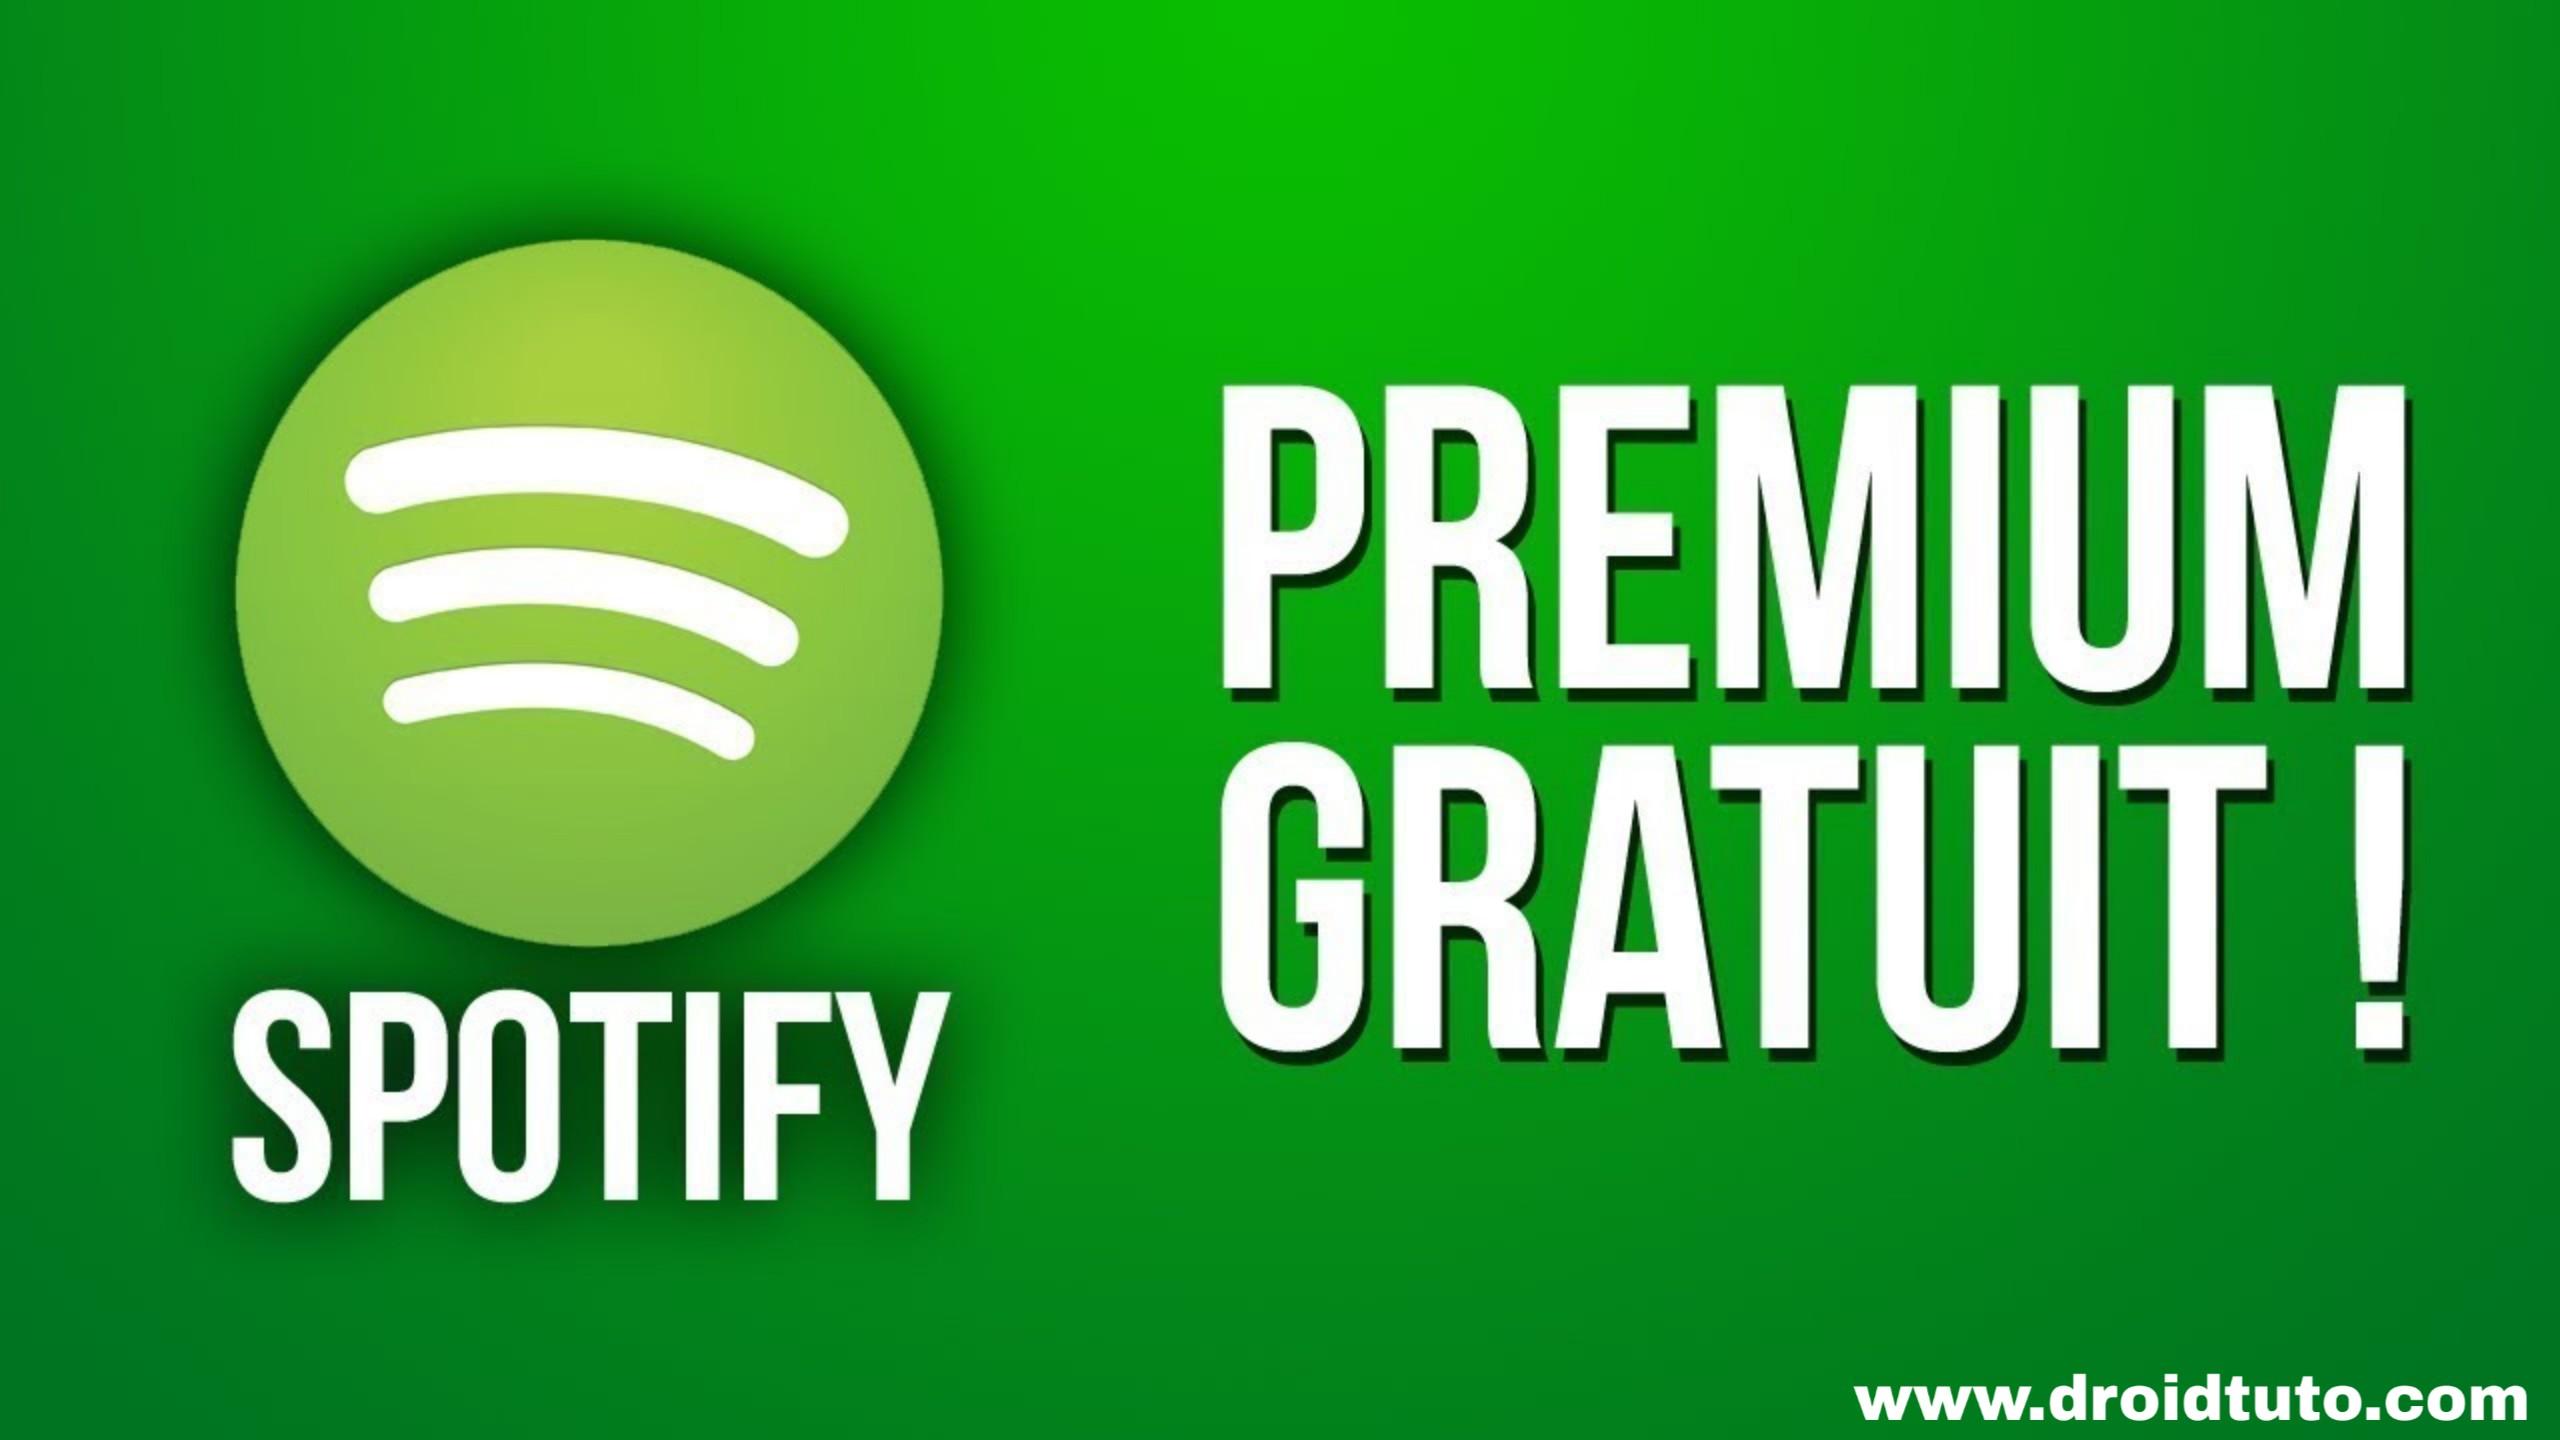 spotify premium gratuit